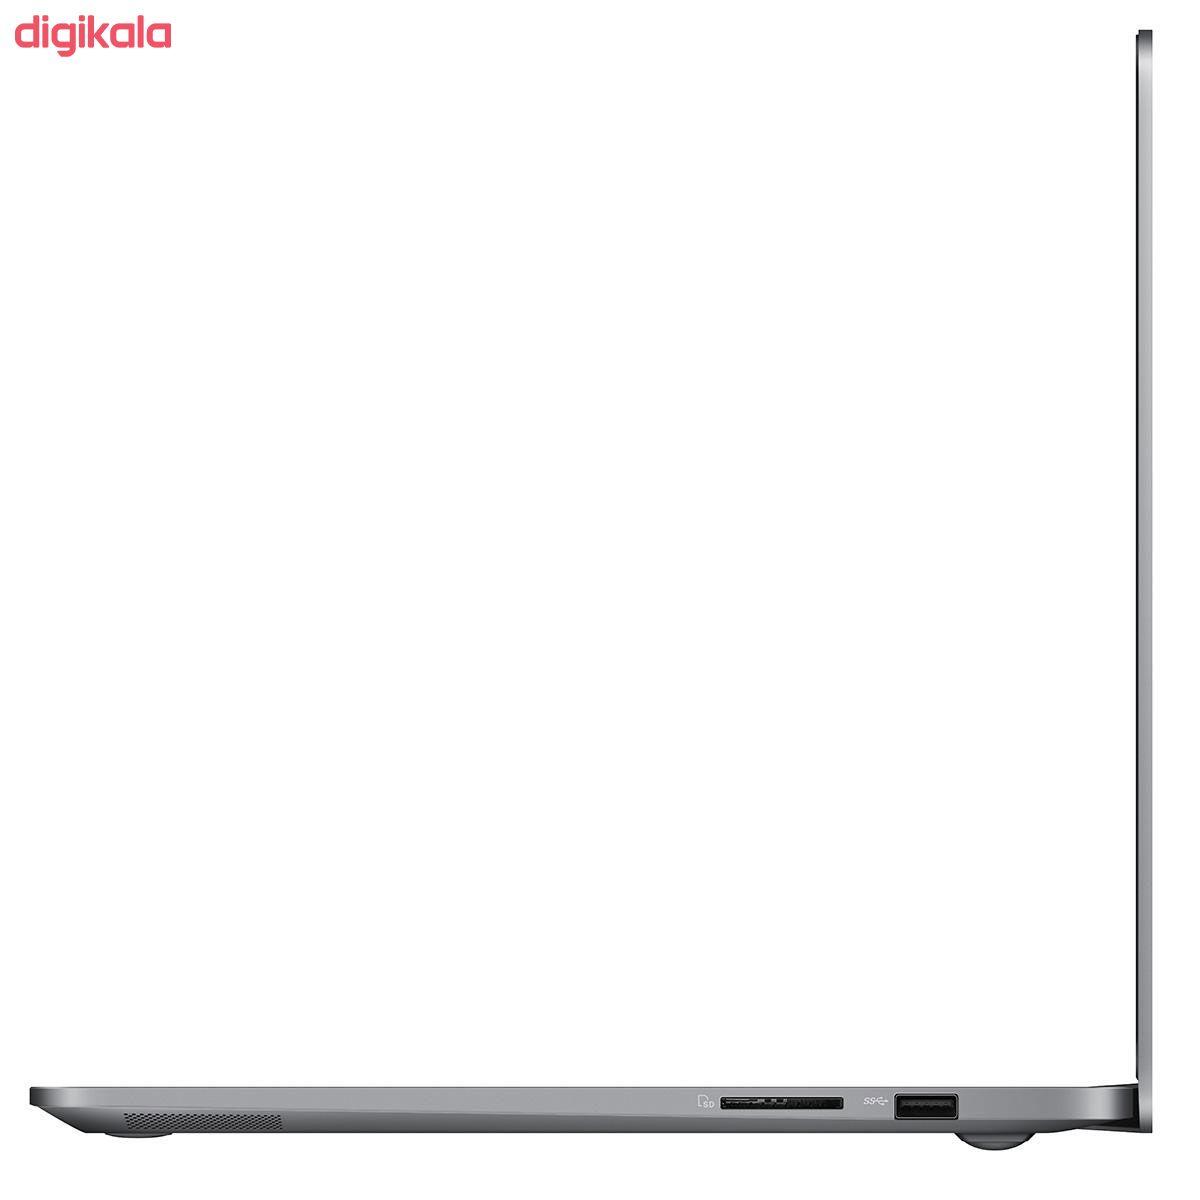 لپ تاپ 14 اینچی ایسوس مدل ASUSPRO P5440